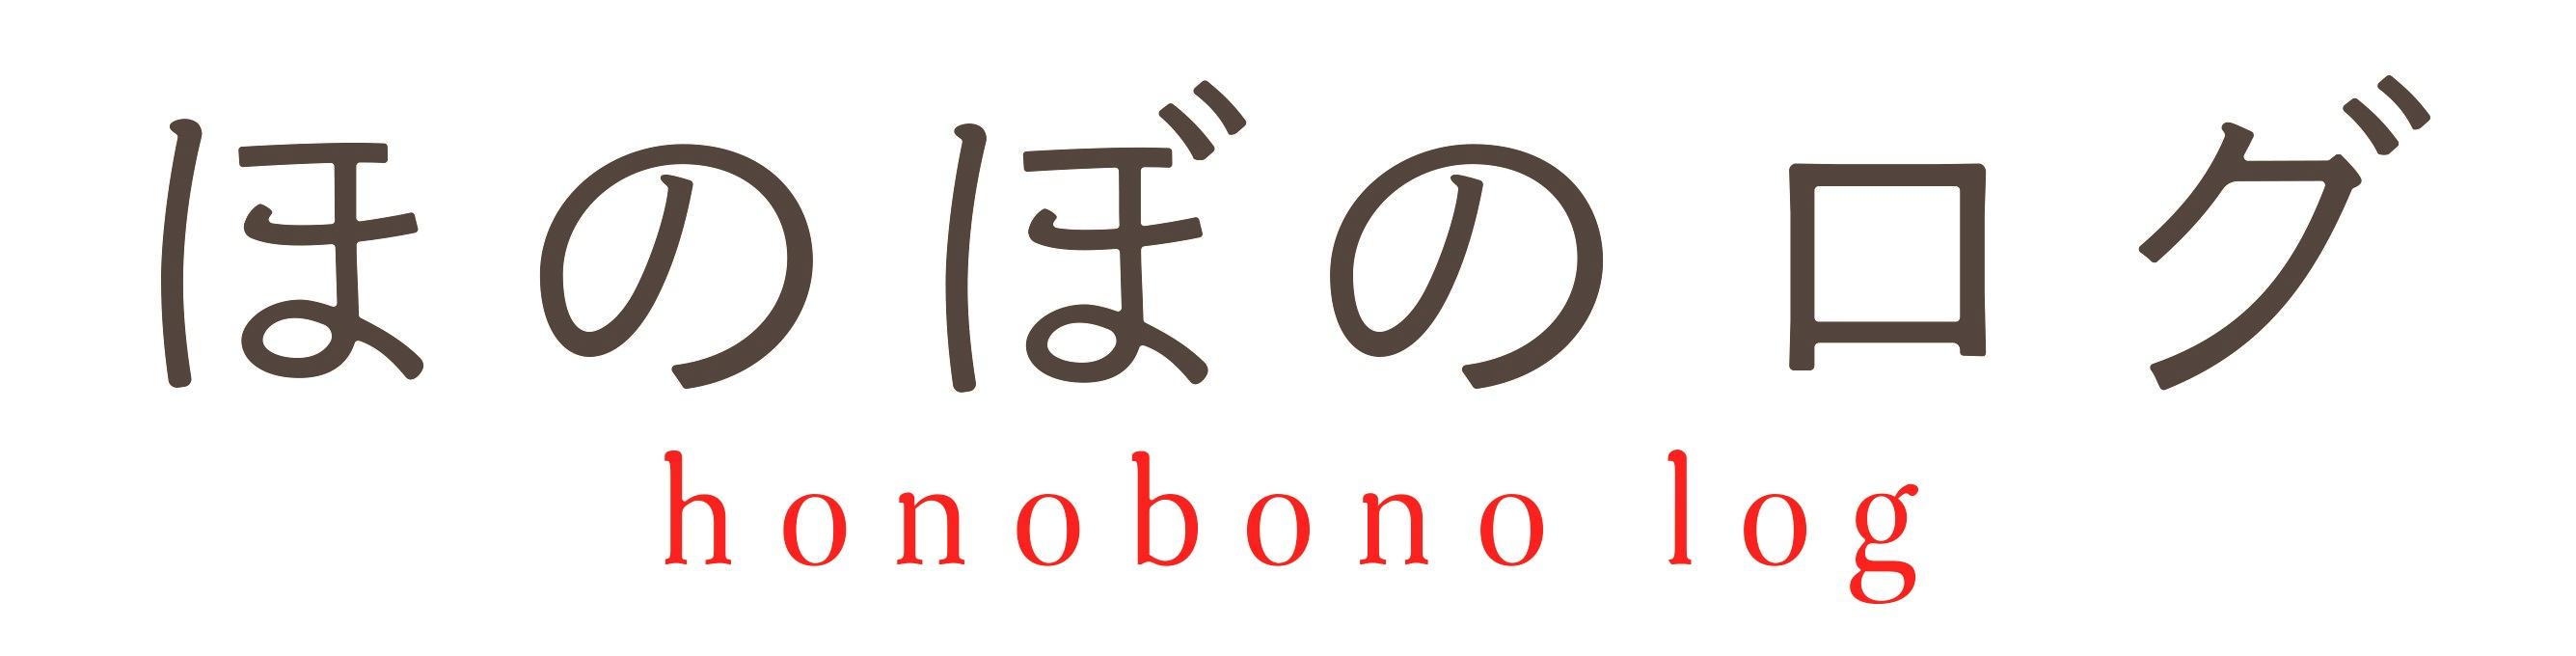 honobono_logo